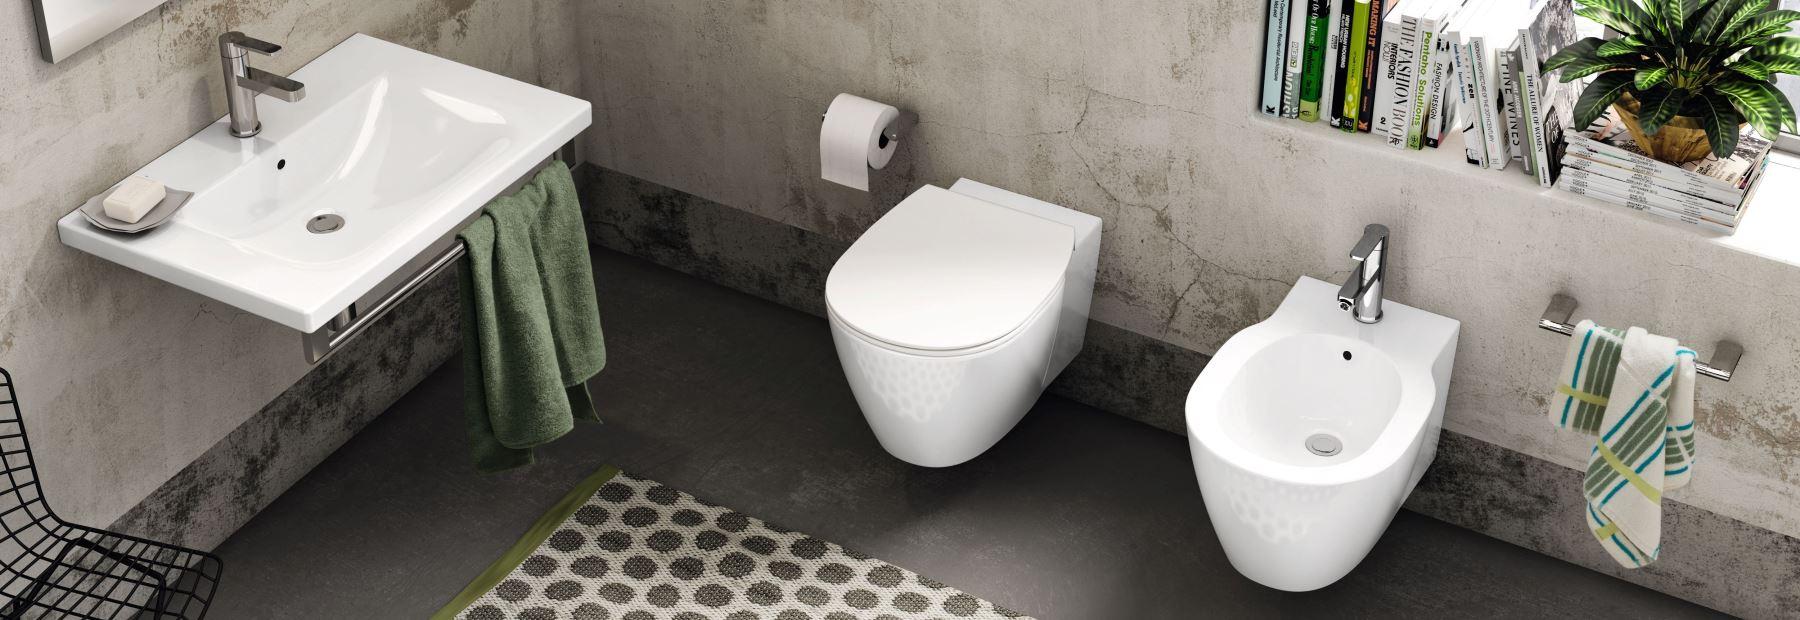 Jaukurai WC Ideal Standard